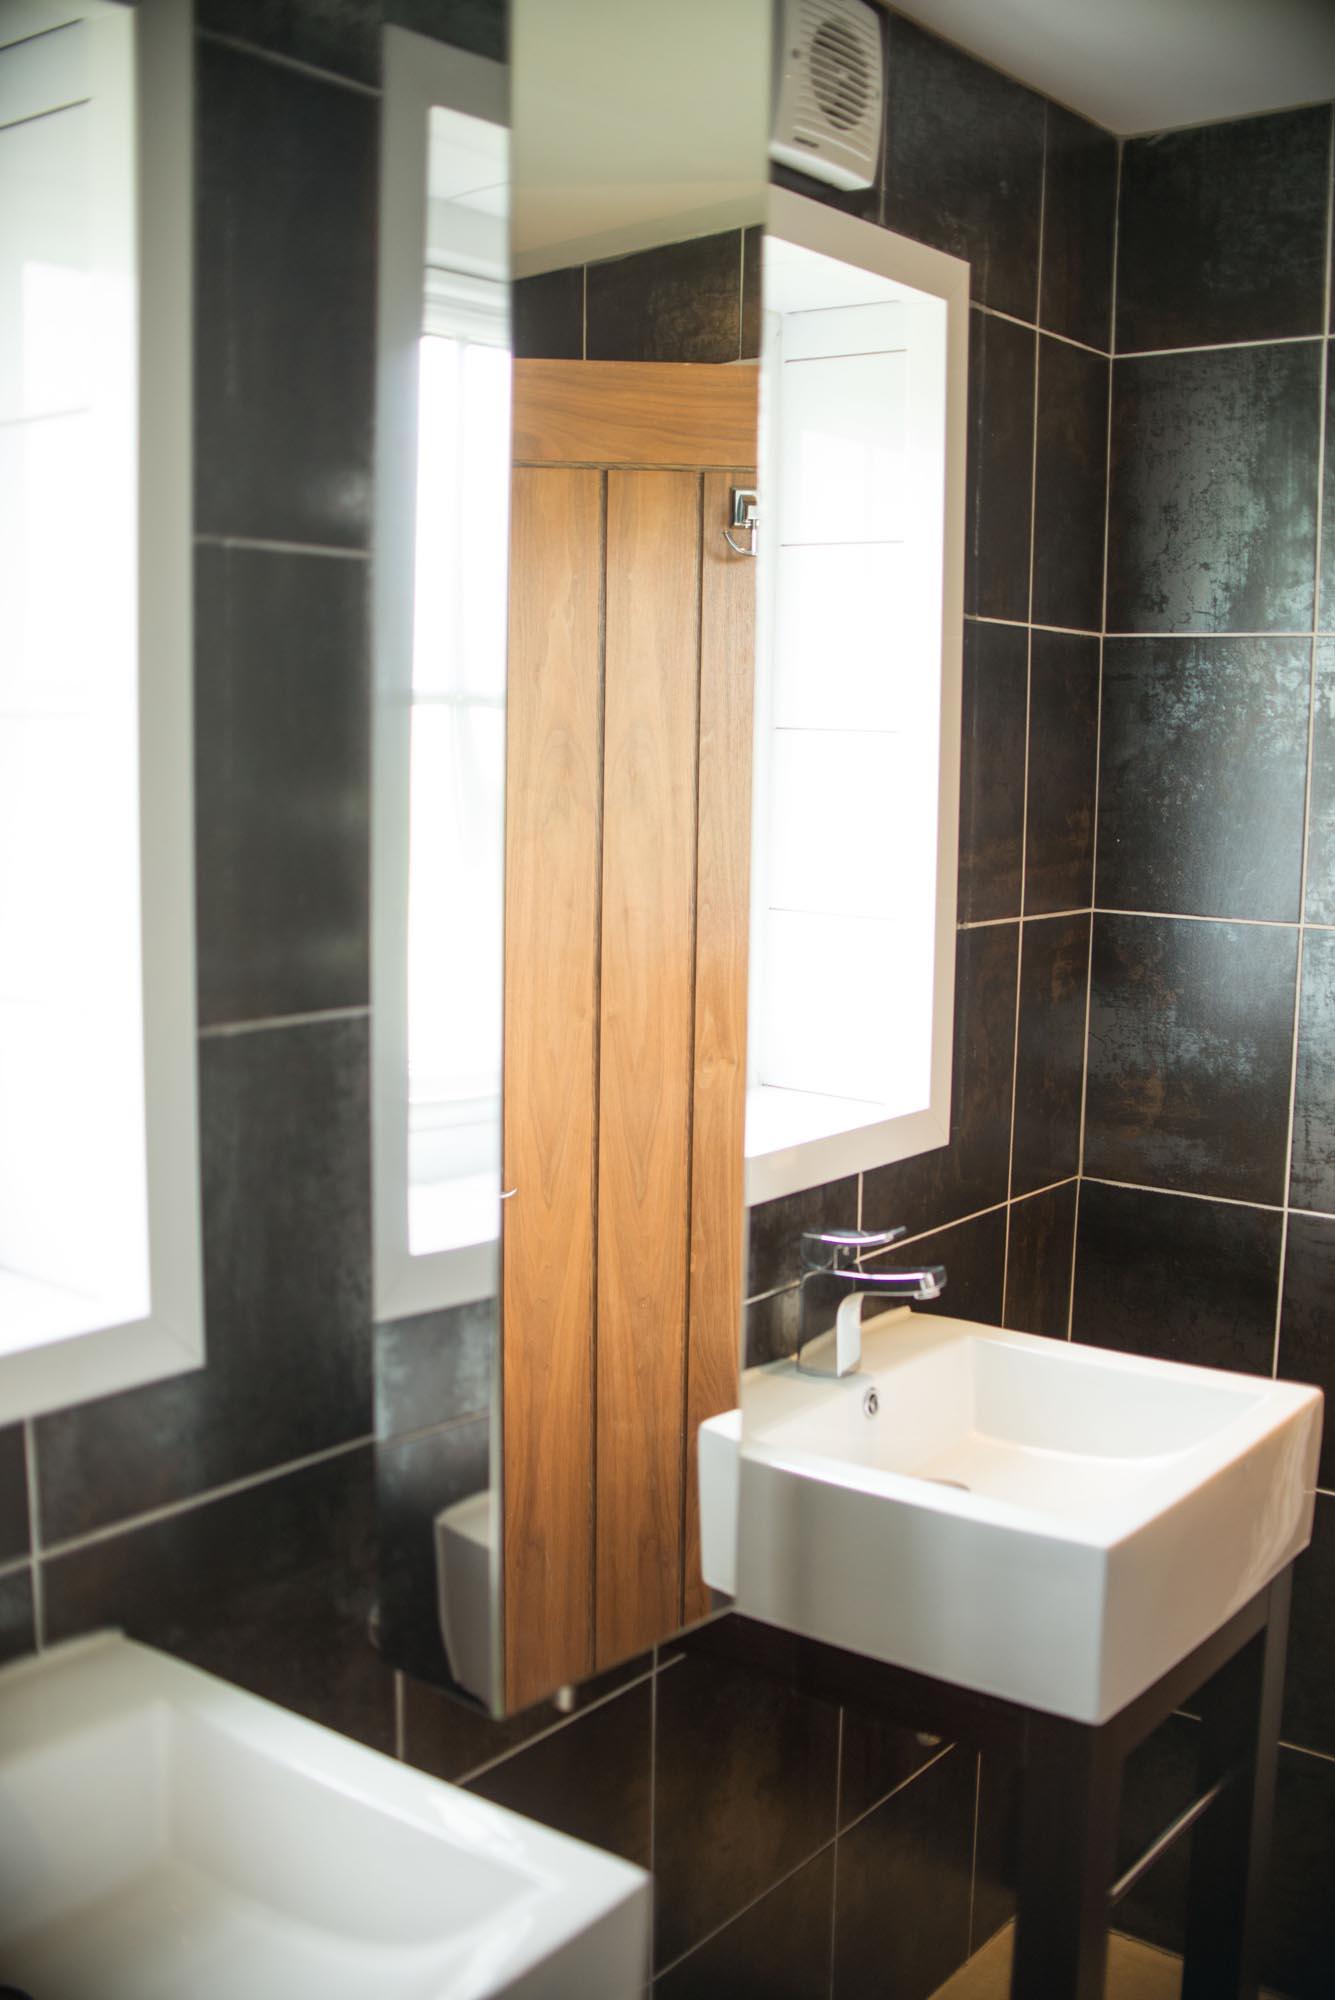 luxury lodges east yorkshire, Hot tub lodge Yorkshire